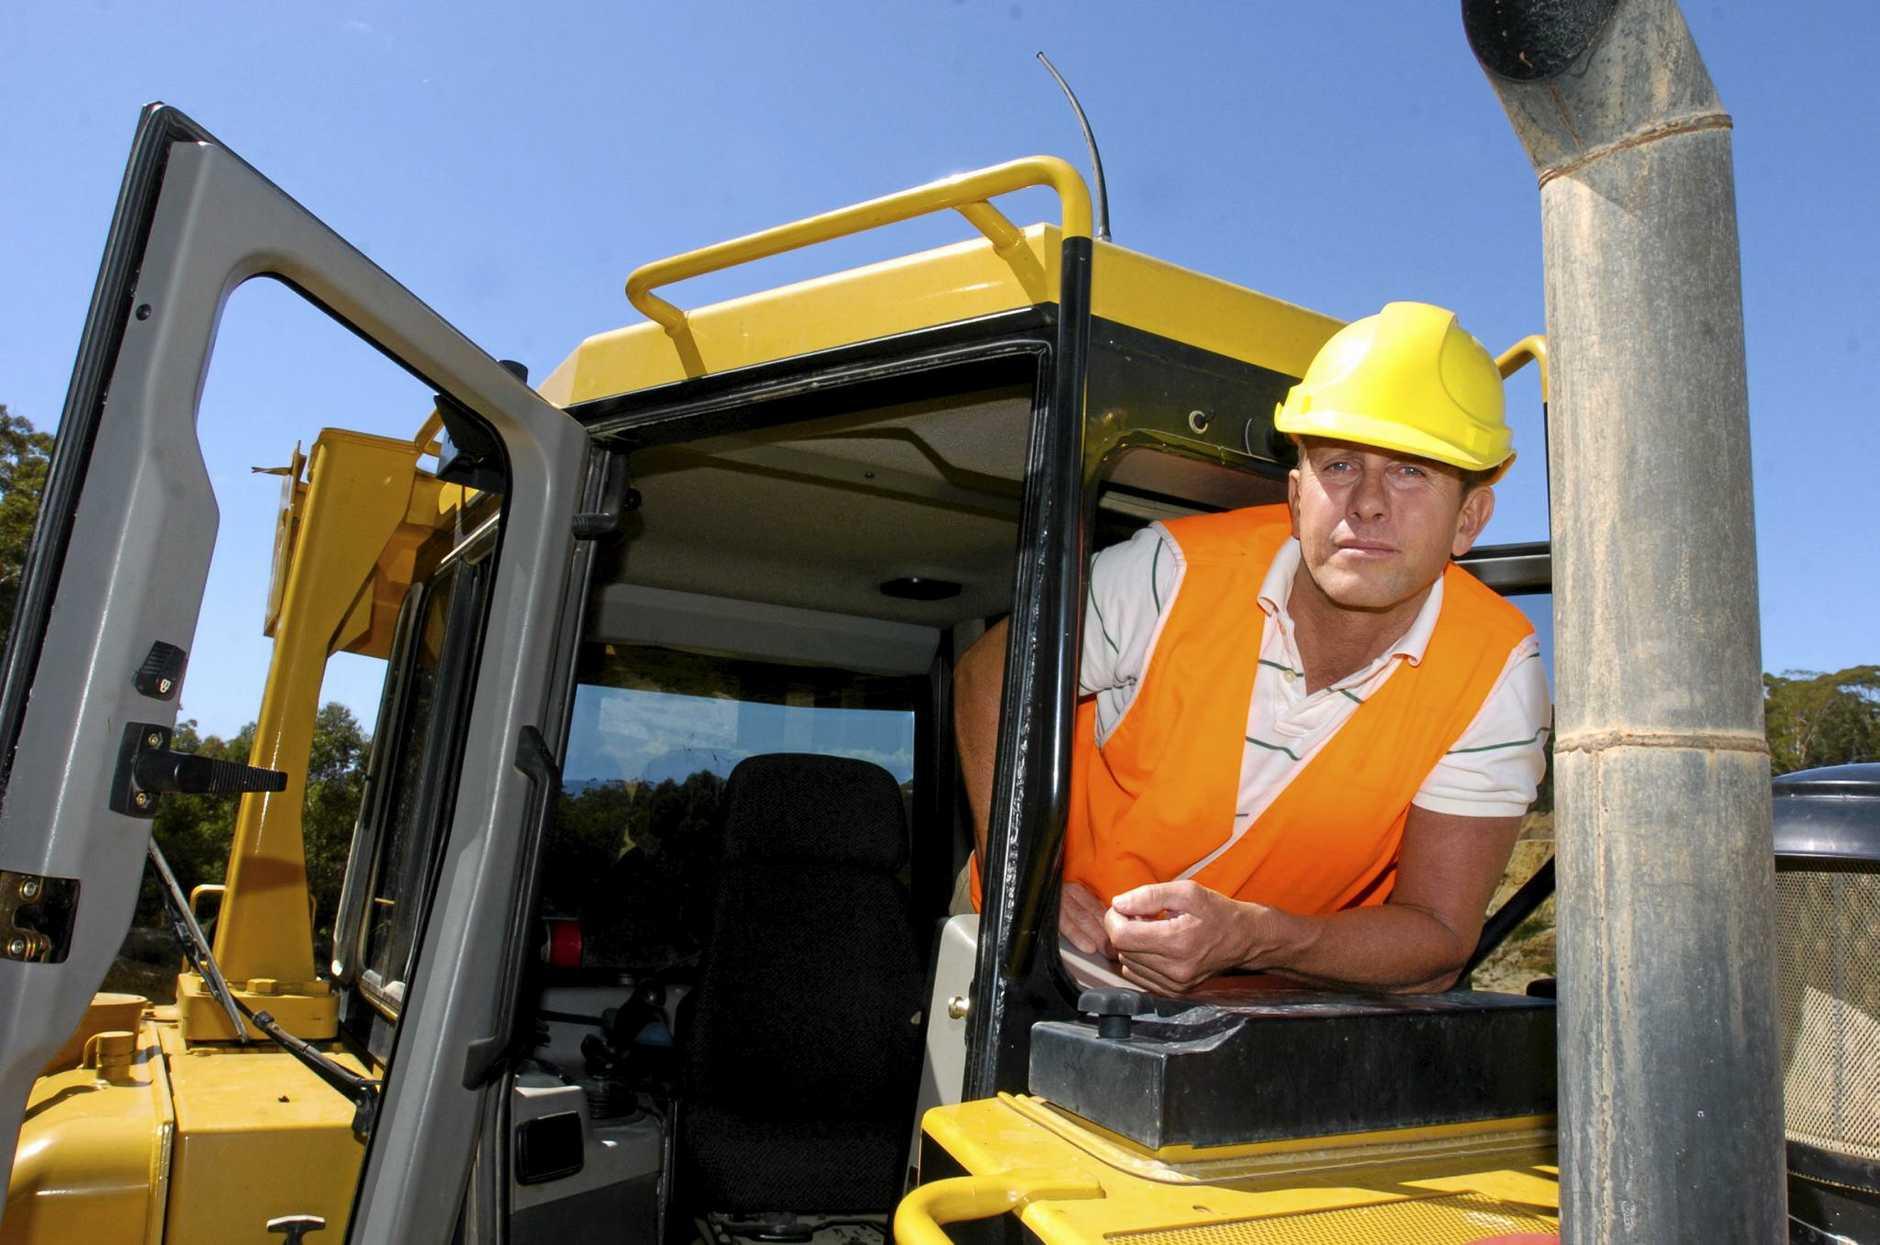 FRAUDSTER: Luke Bracken during his stint as executive chairman of Bracken International Mining.